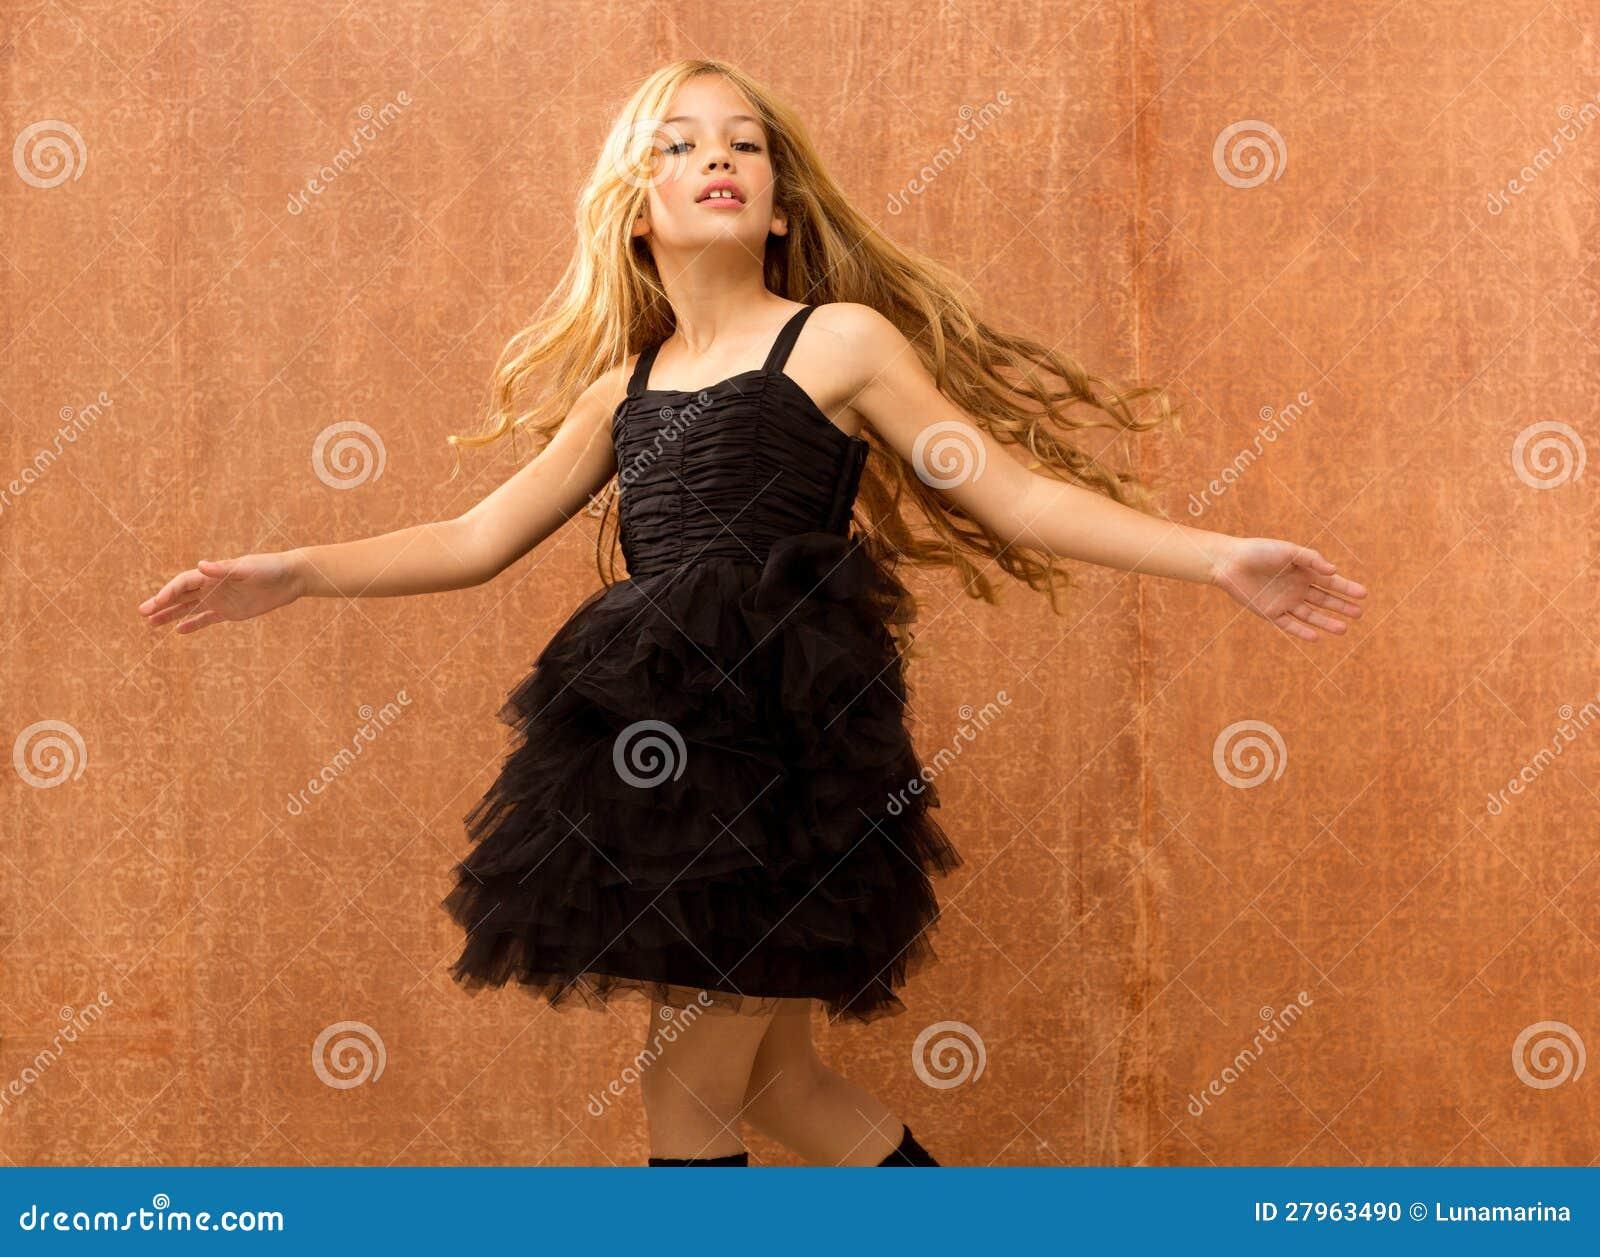 Black Girls Dancing Videos